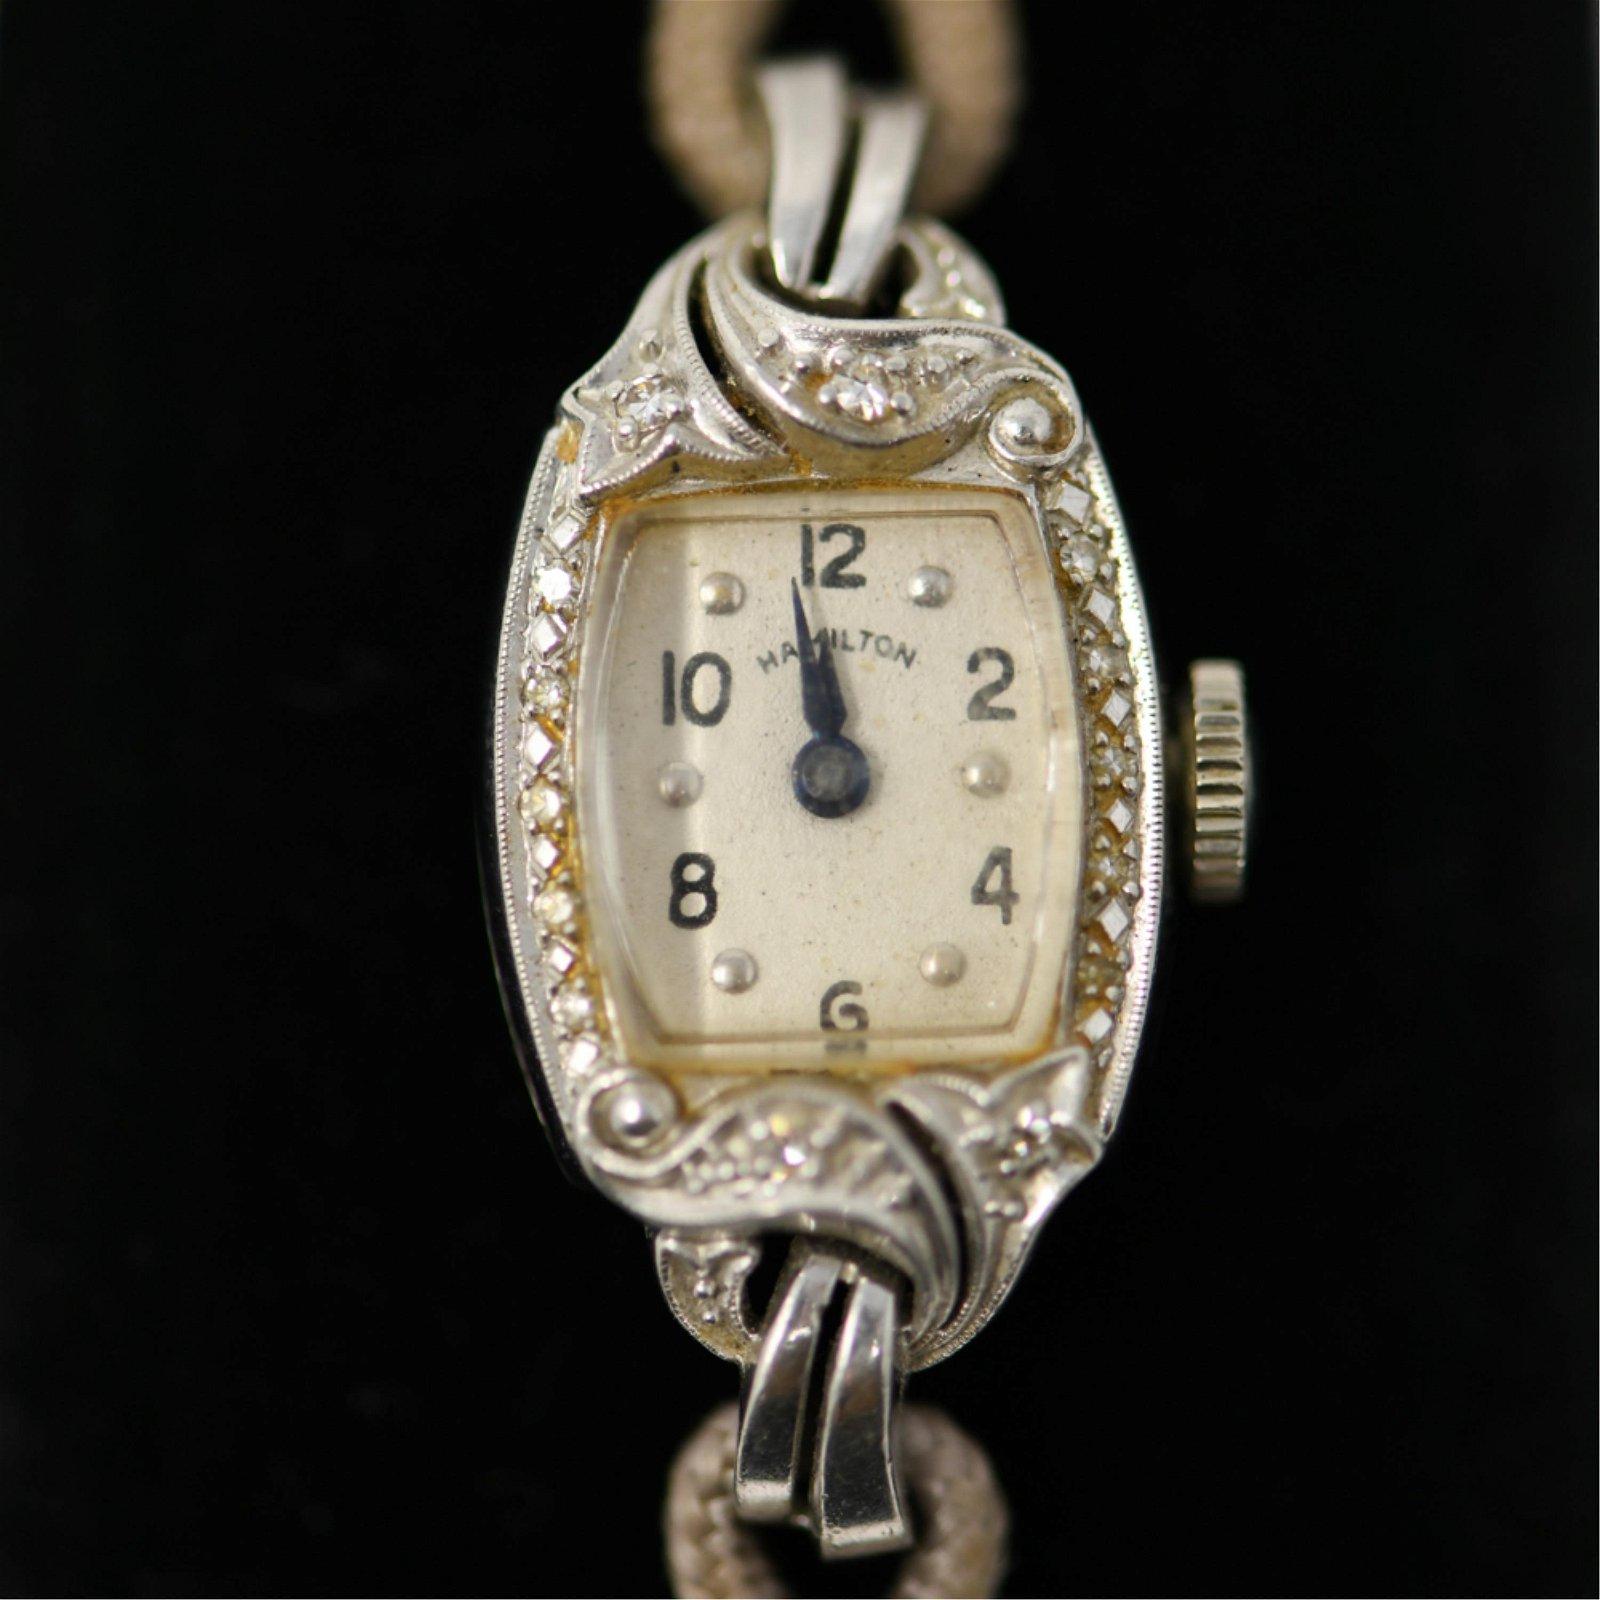 LADIES PLATINUM & DIAMOND HAMILTON WRIST WATCH